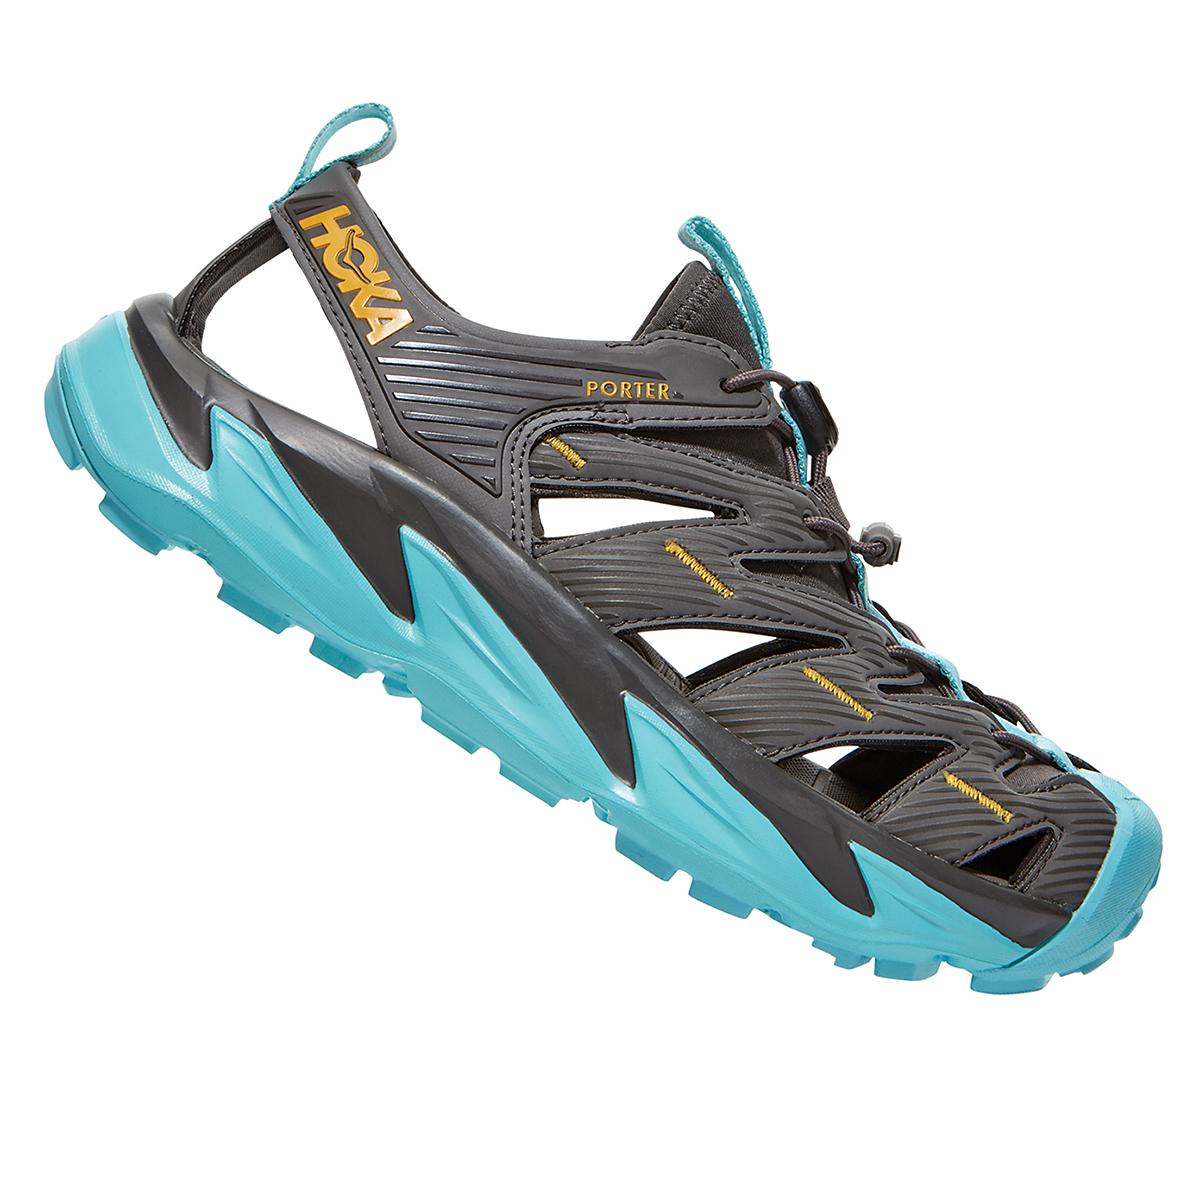 Women's Hoka One One Hopara Hiking Shoe - Color: Dark Gull Grey/Antigua Sand - Size: 5 - Width: Regular, Dark Gull Grey/Antigua Sand, large, image 1